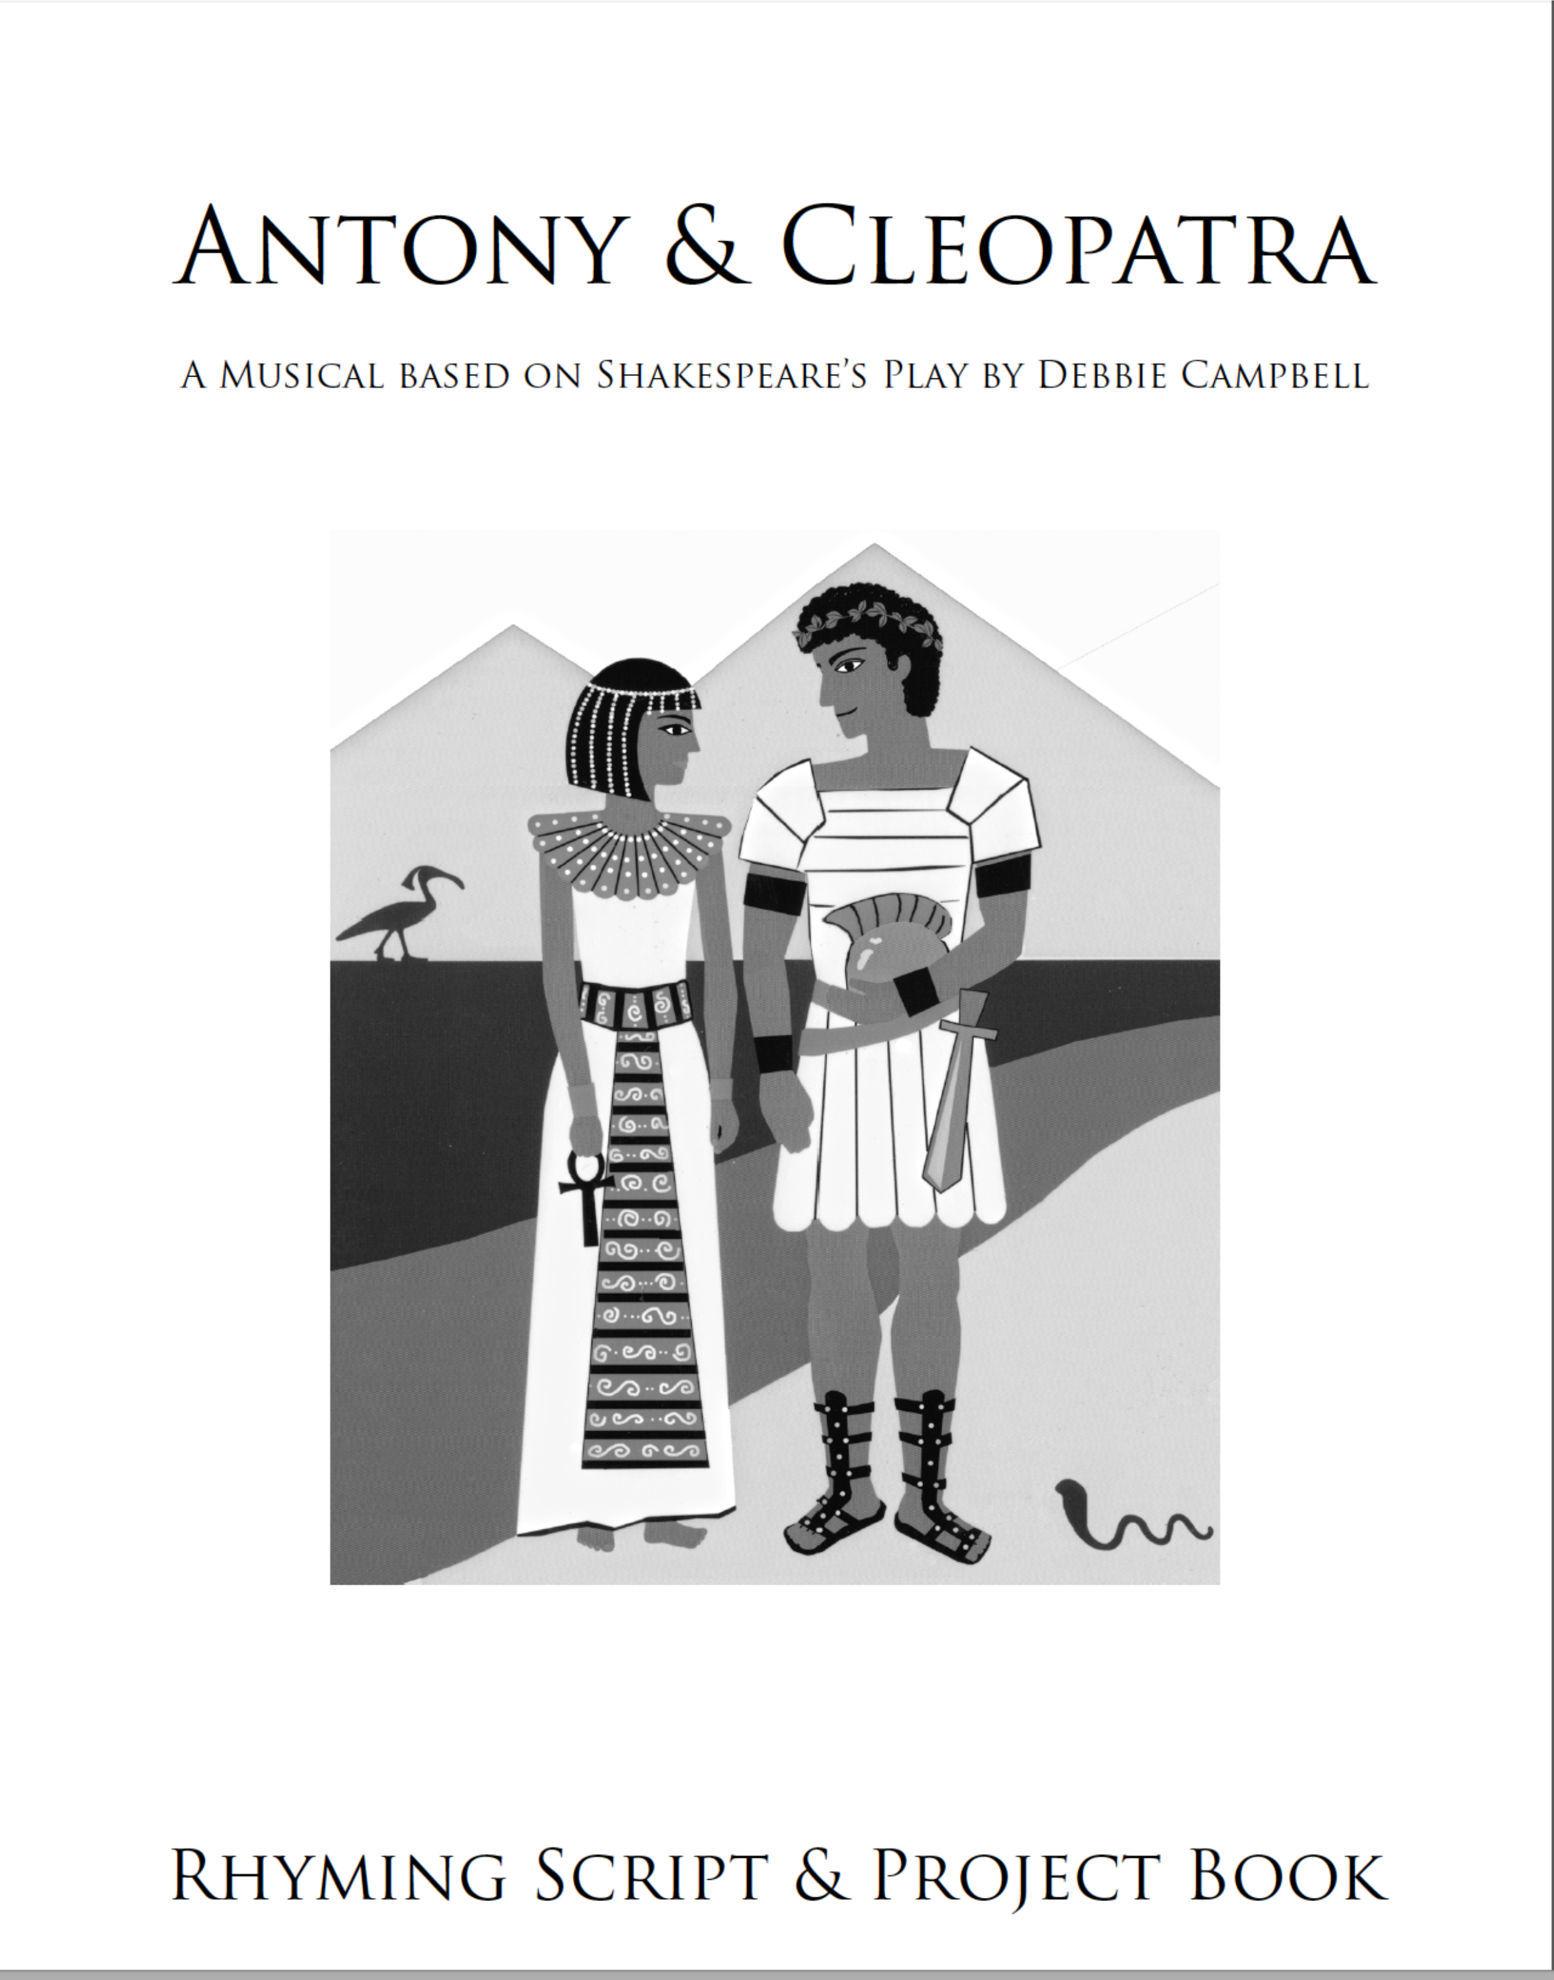 Antony & Cleopatra_Script_Modern_Rhyming_Text